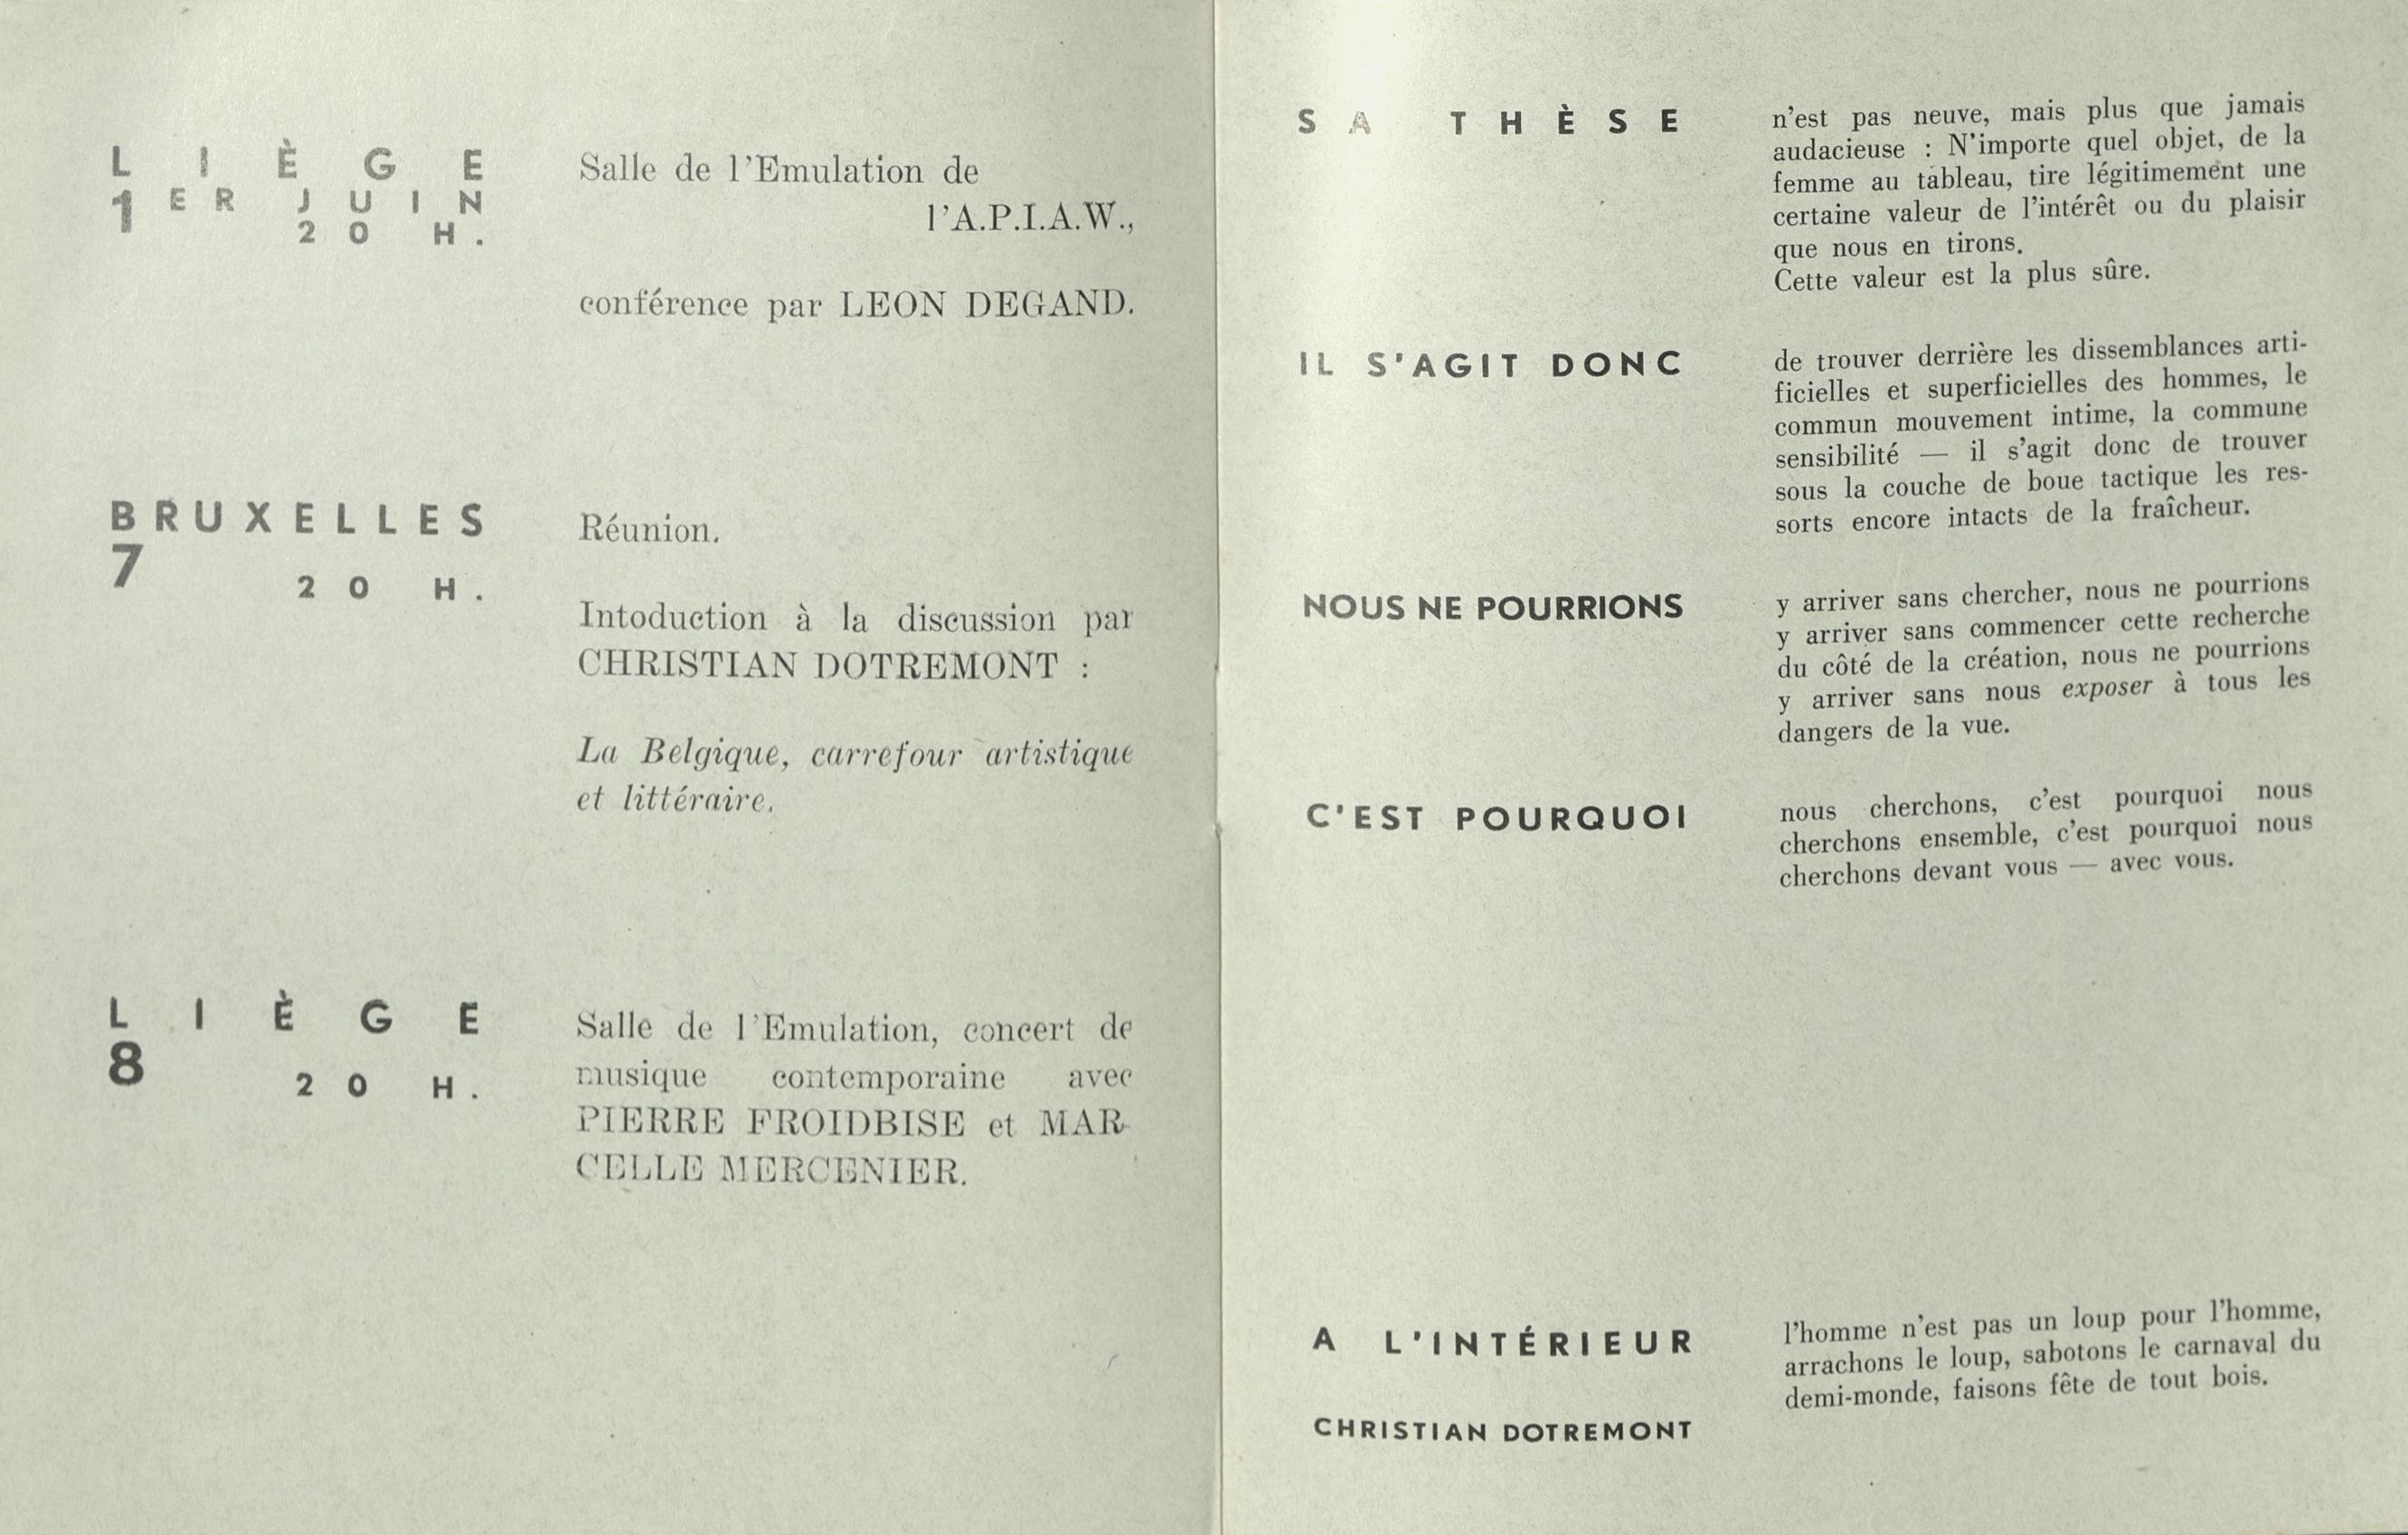 COBRA, La Louvière Liège et Bruxelles, 1950; Archiv der Avantgarden, Staatliche Kunstsammlungen Dresden